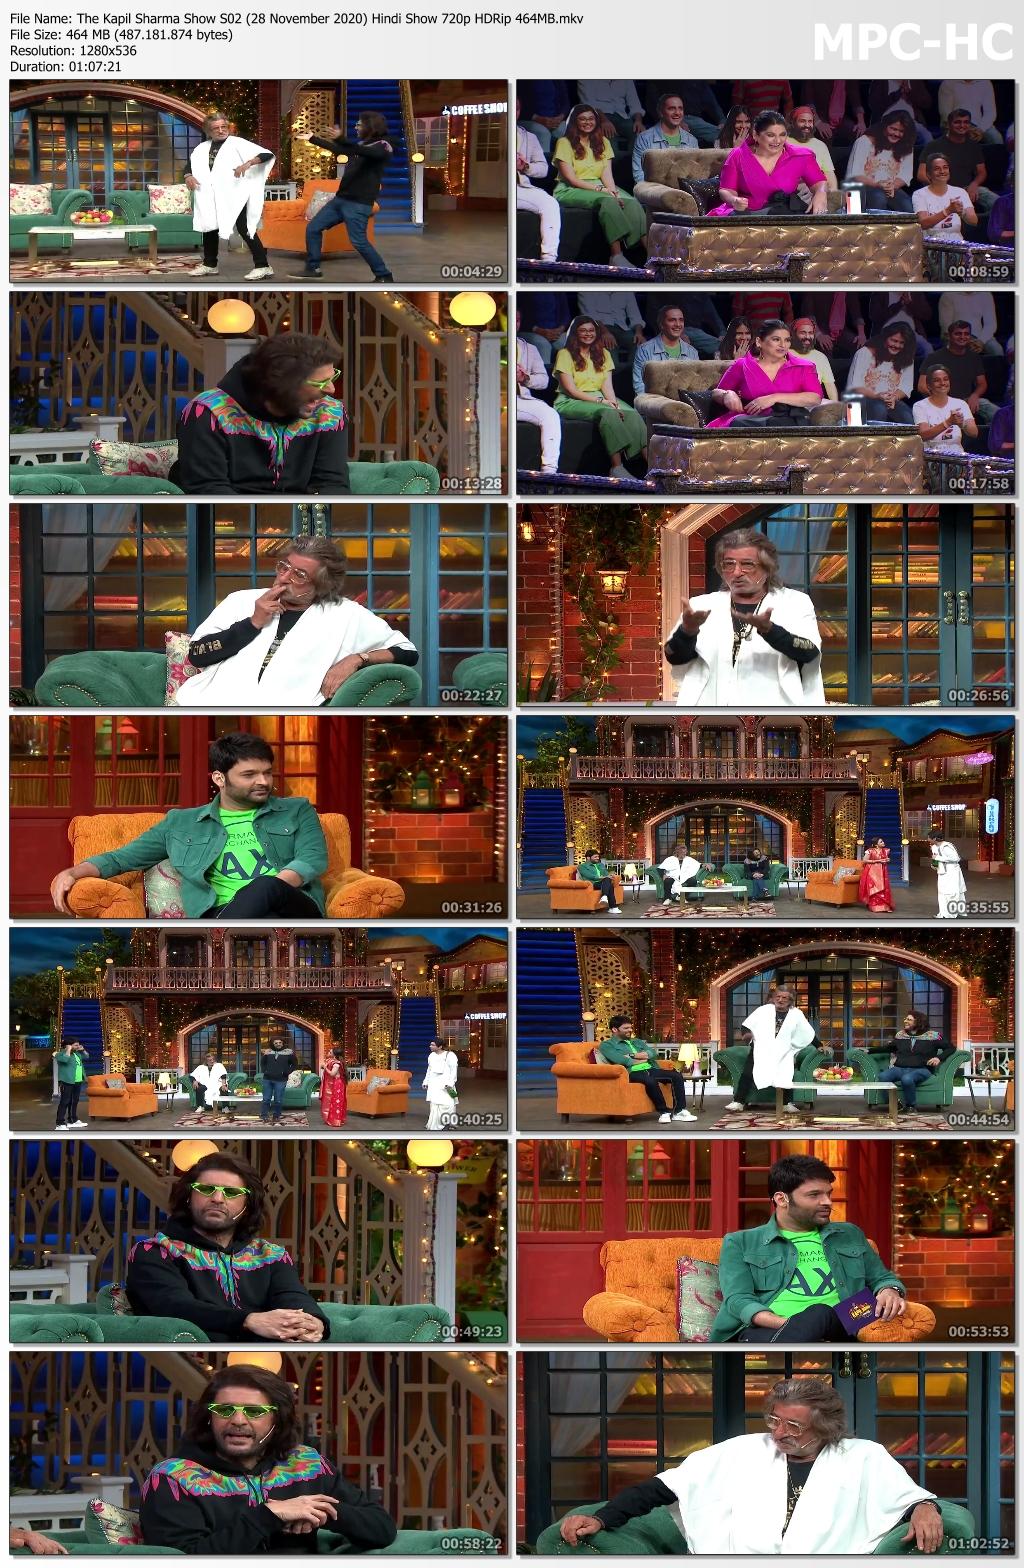 The-Kapil-Sharma-Show-S02-28-November-2020-Hindi-Show-720p-HDRip-464-MB-mkv-thumbs